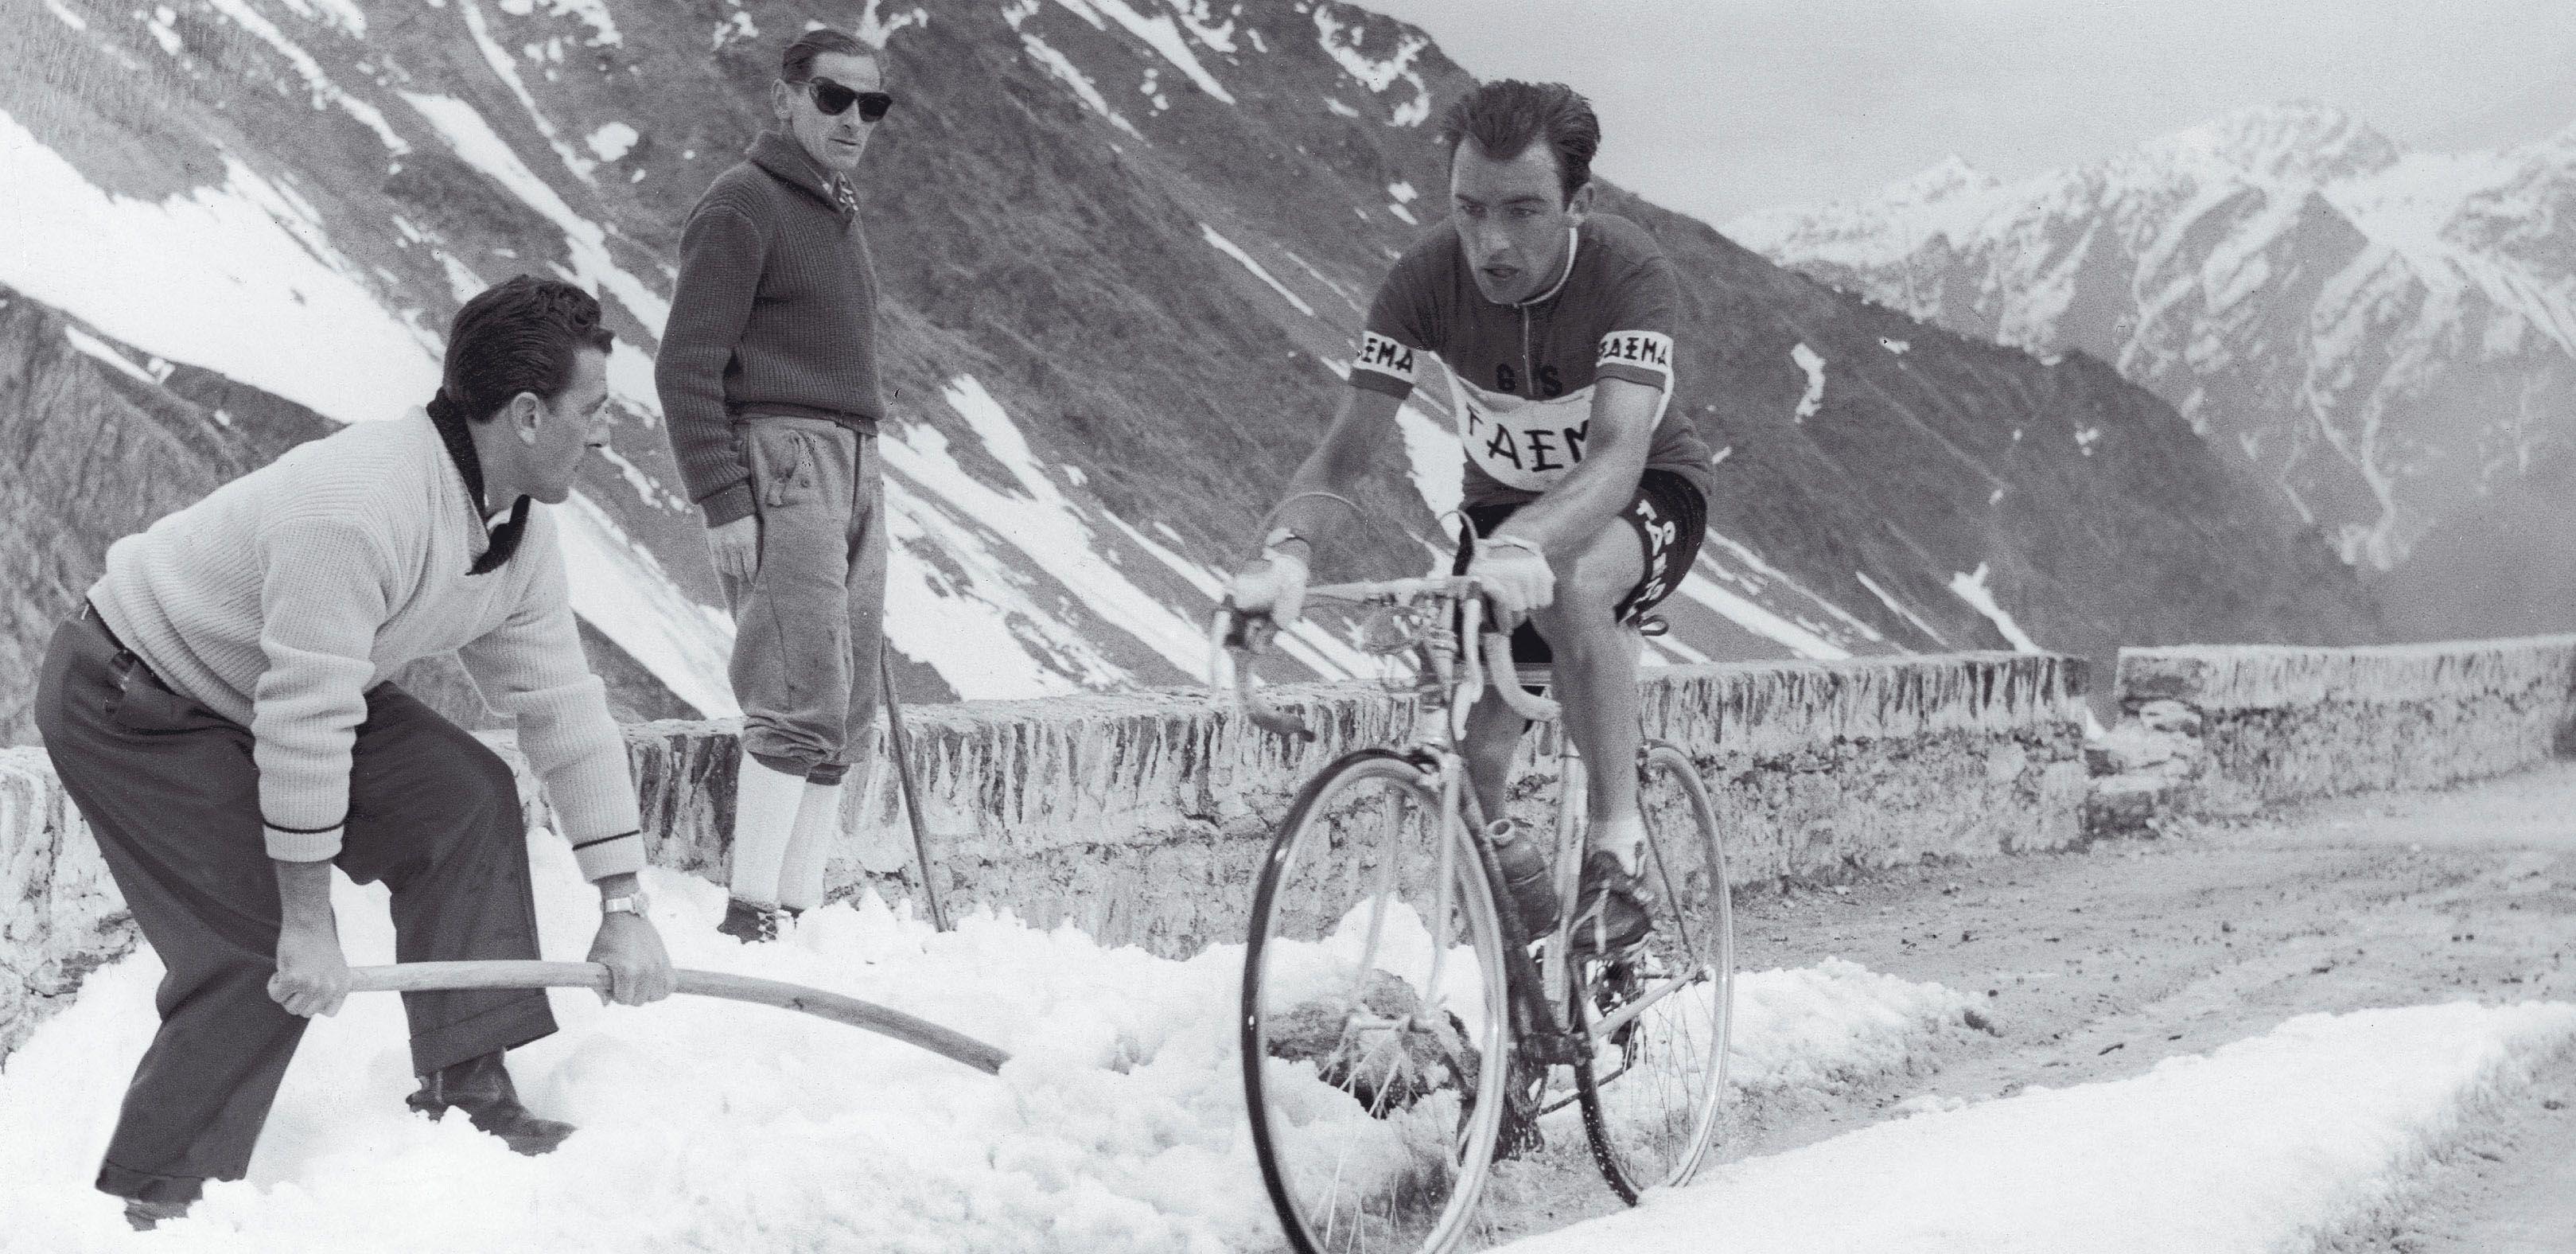 Giro d'Italia 1956. 21^Tappa, 8 giugno. Merano > Monte Bondone. Charly Gaul (1932-2005)